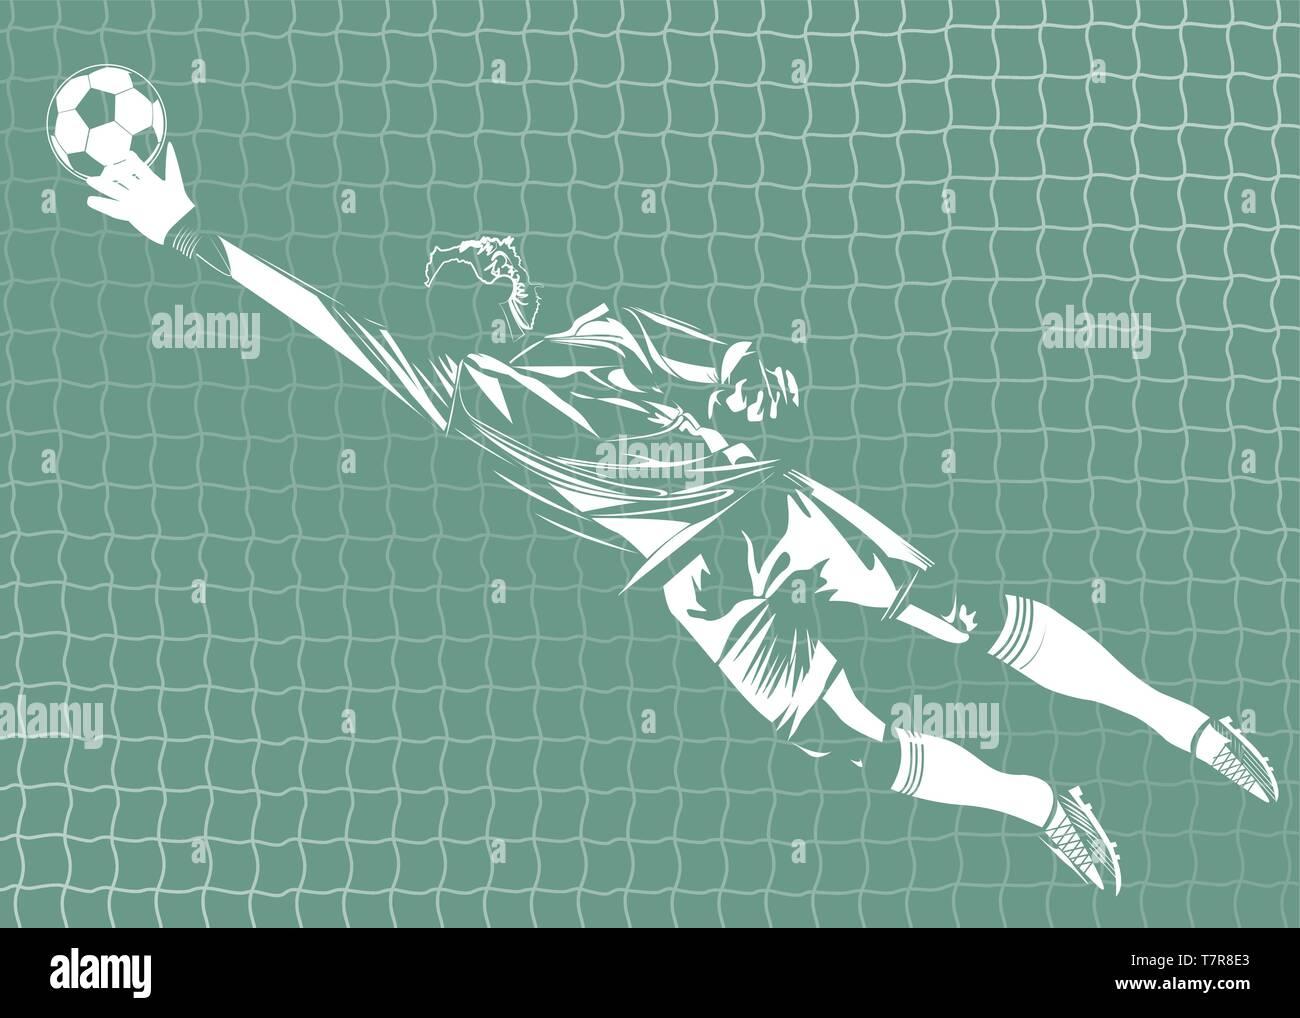 vector illustration of goalkeeper - Stock Vector